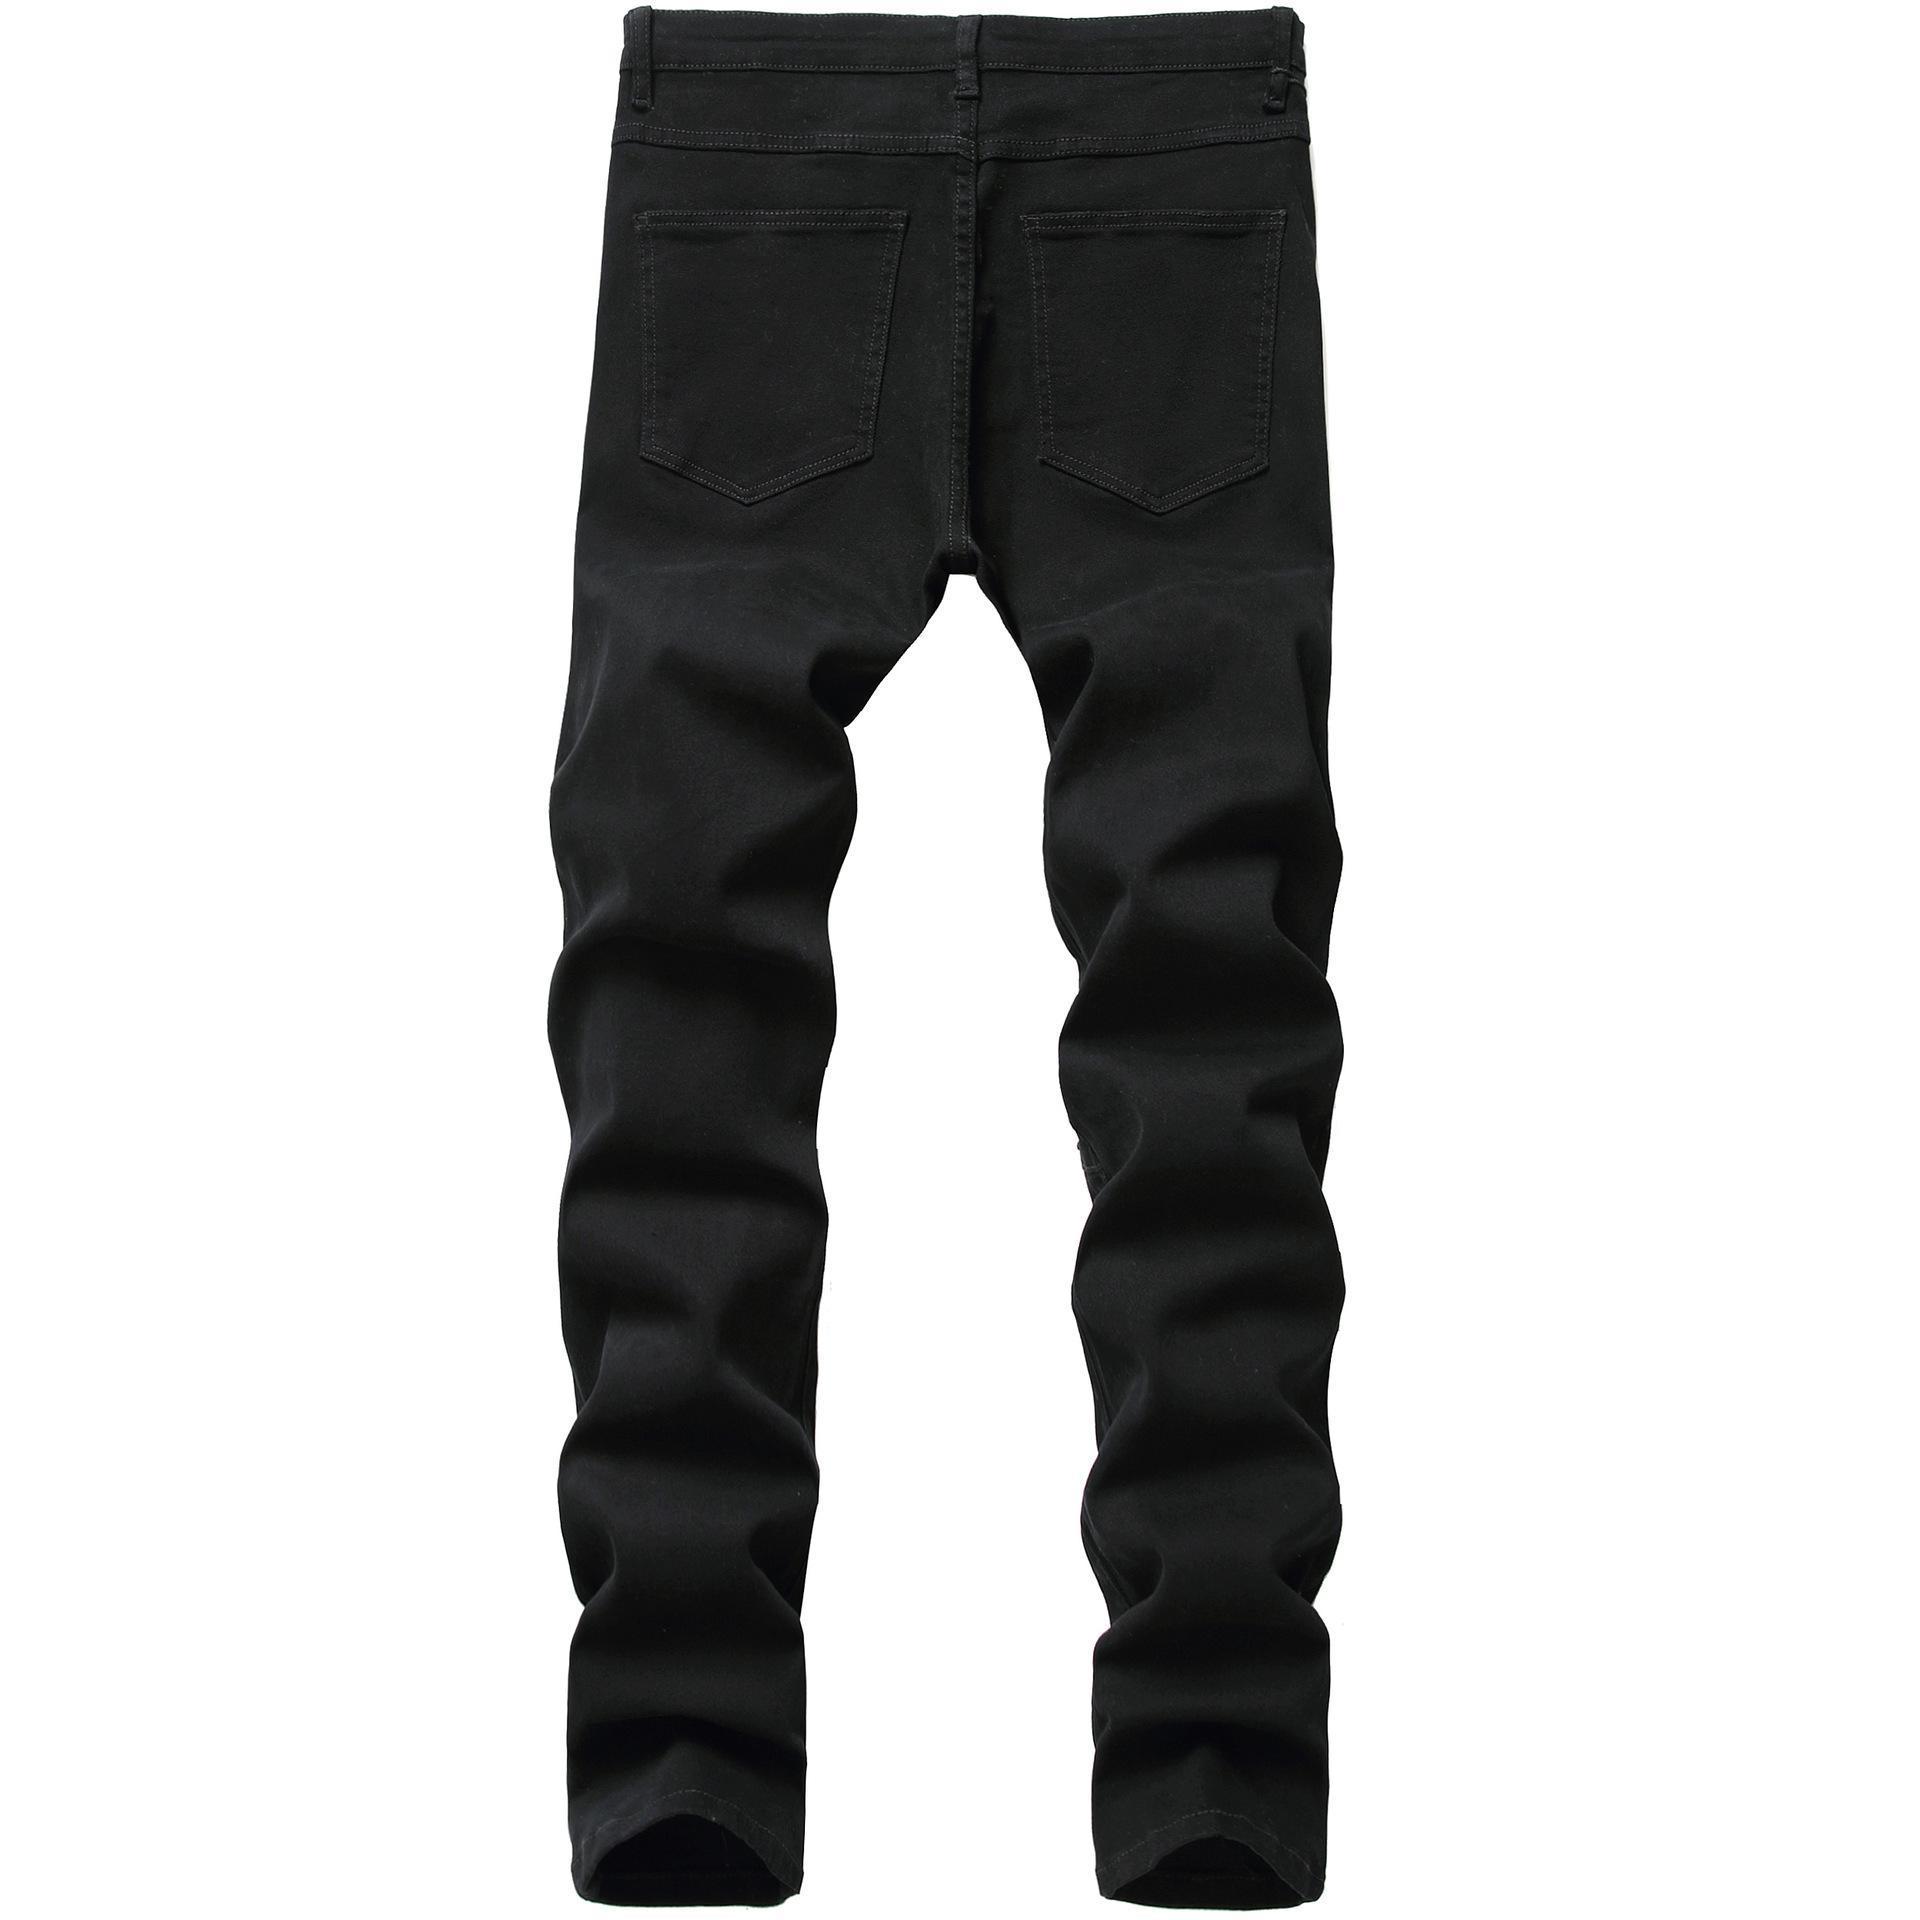 Mens Black Jeans Fashion Ripped Denim Pants Skinny Pencil Jeans Pants Holes Broken Biker Jeans Plain Solid Pants